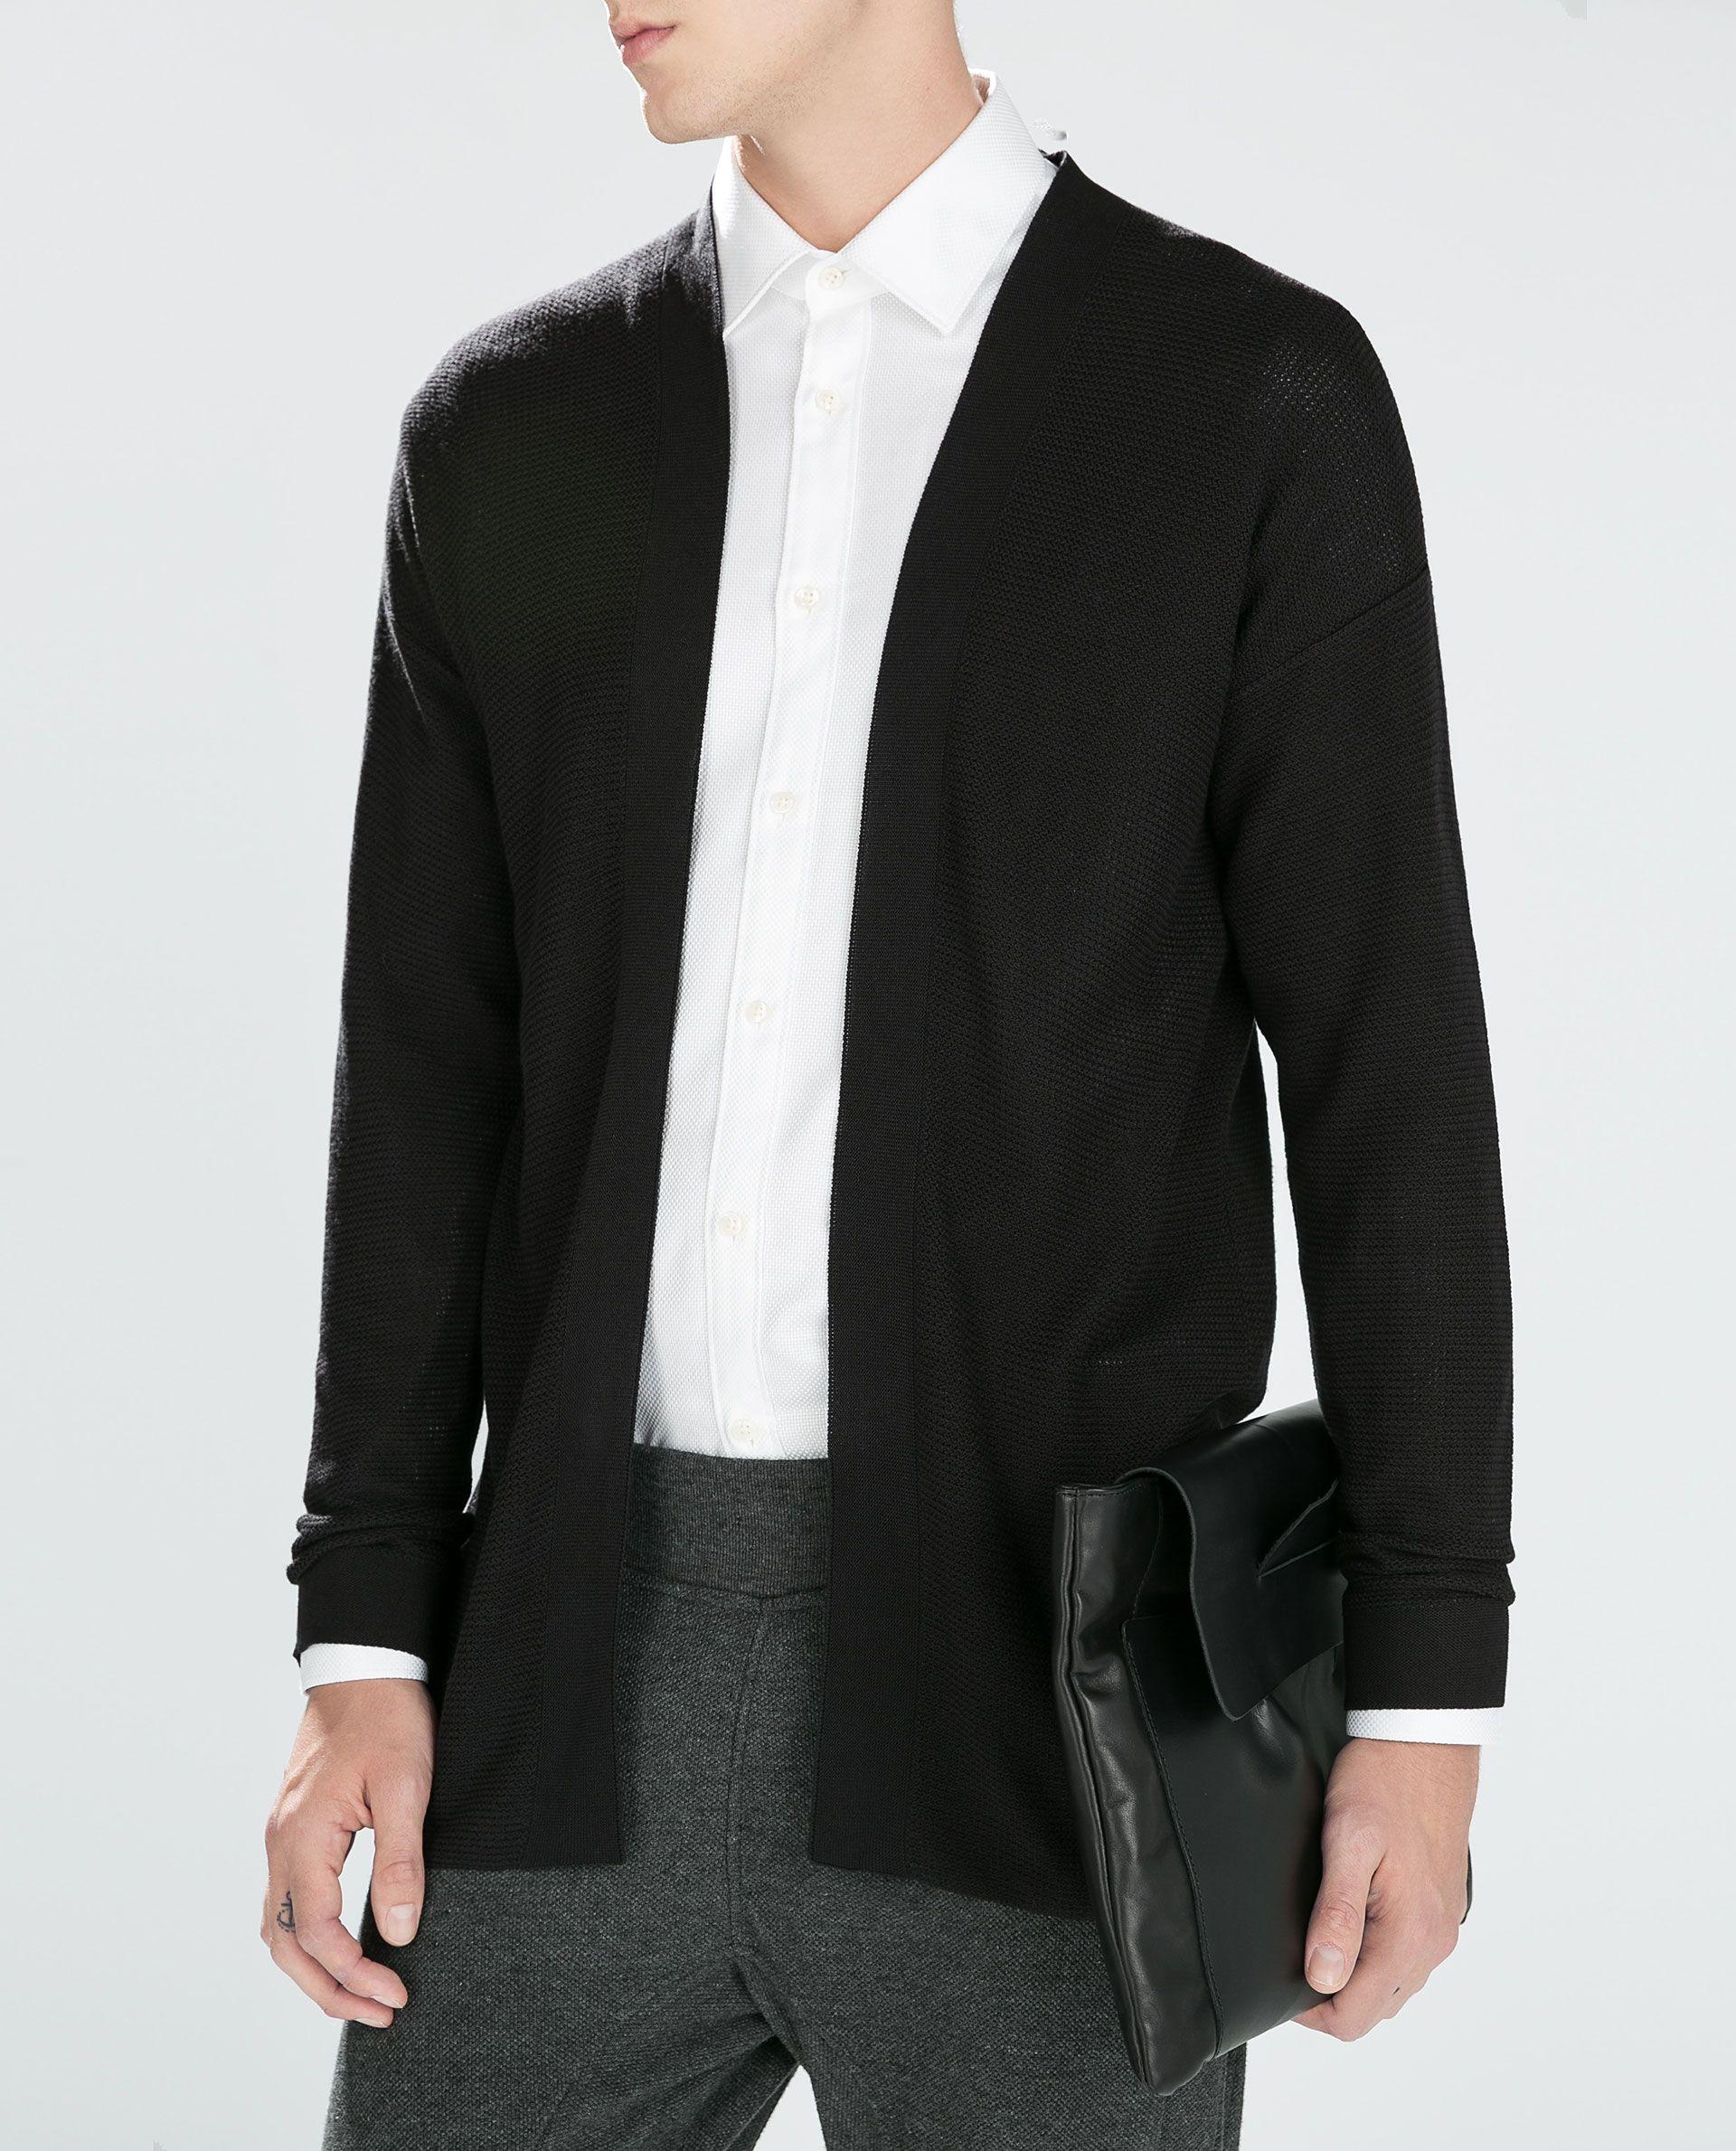 Coats & Jackets Clothes, Shoes & Accessories Open Jacket Zara Man